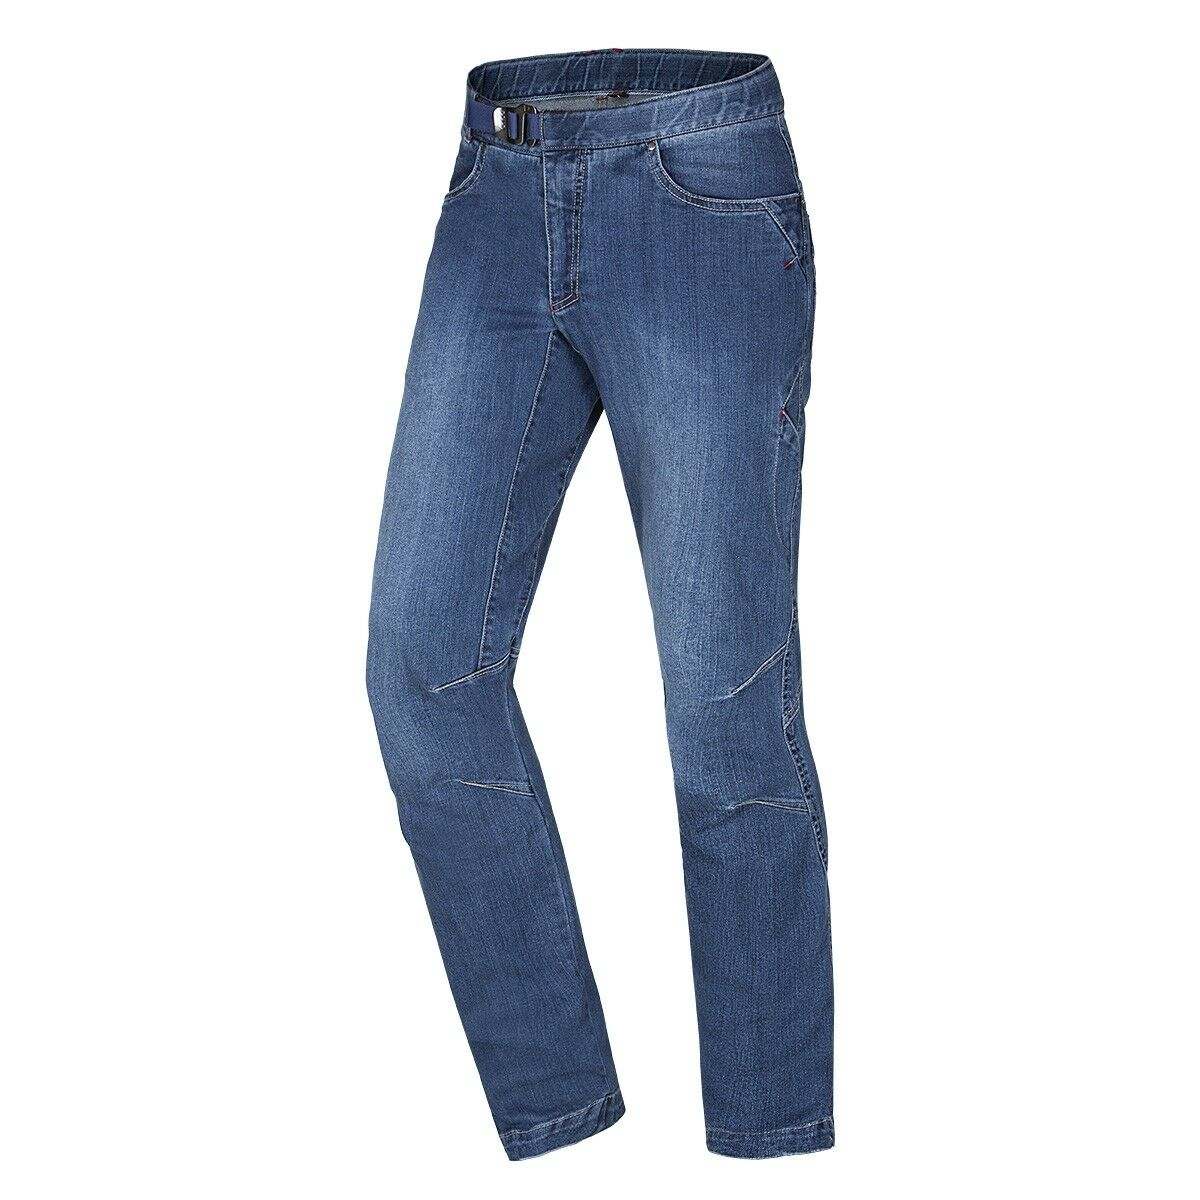 OCUN HURRIKAN JEANS - Men´s climbing jeans with ergonomic cut